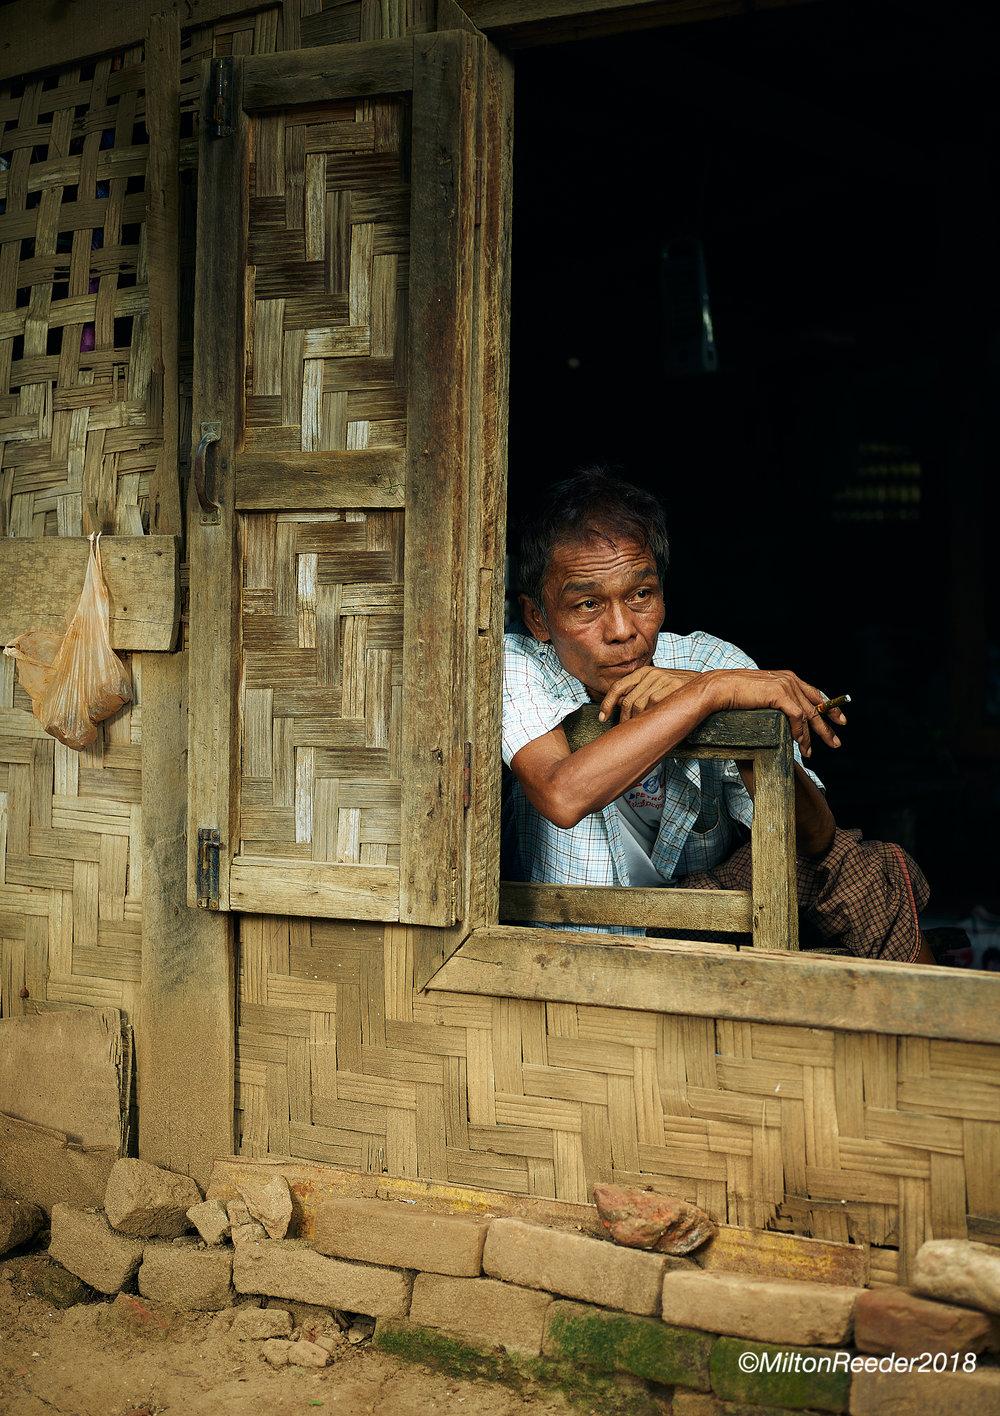 Man in Window, Mandalay, Myanmar